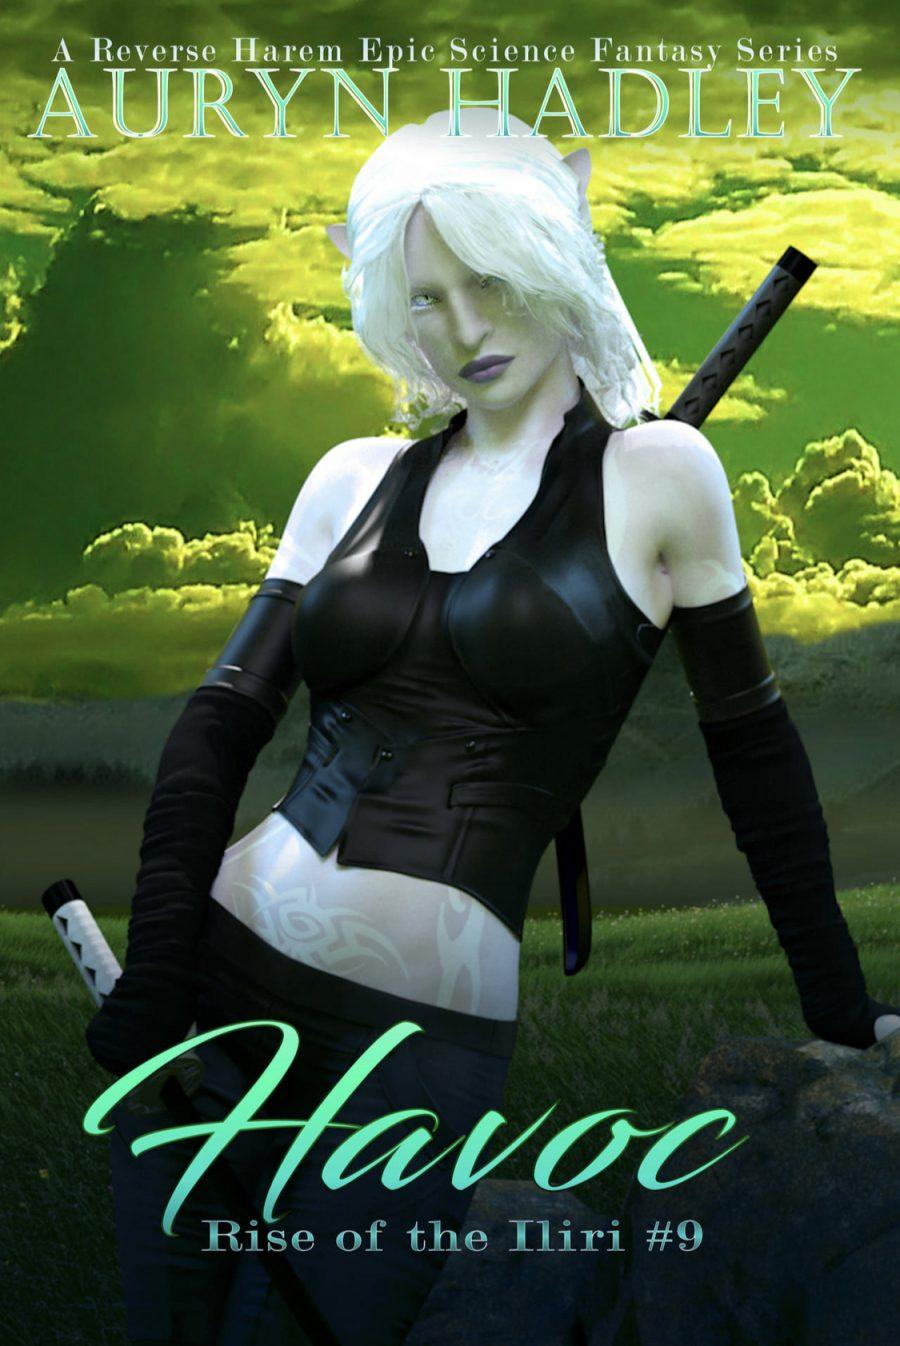 Havoc (Rise of the Iliri - Book #9) by Auryn Hadley - A Book Review #BookReview #EpicFantasy #SciFi #SlowBurn #RH #KindleUnlimited